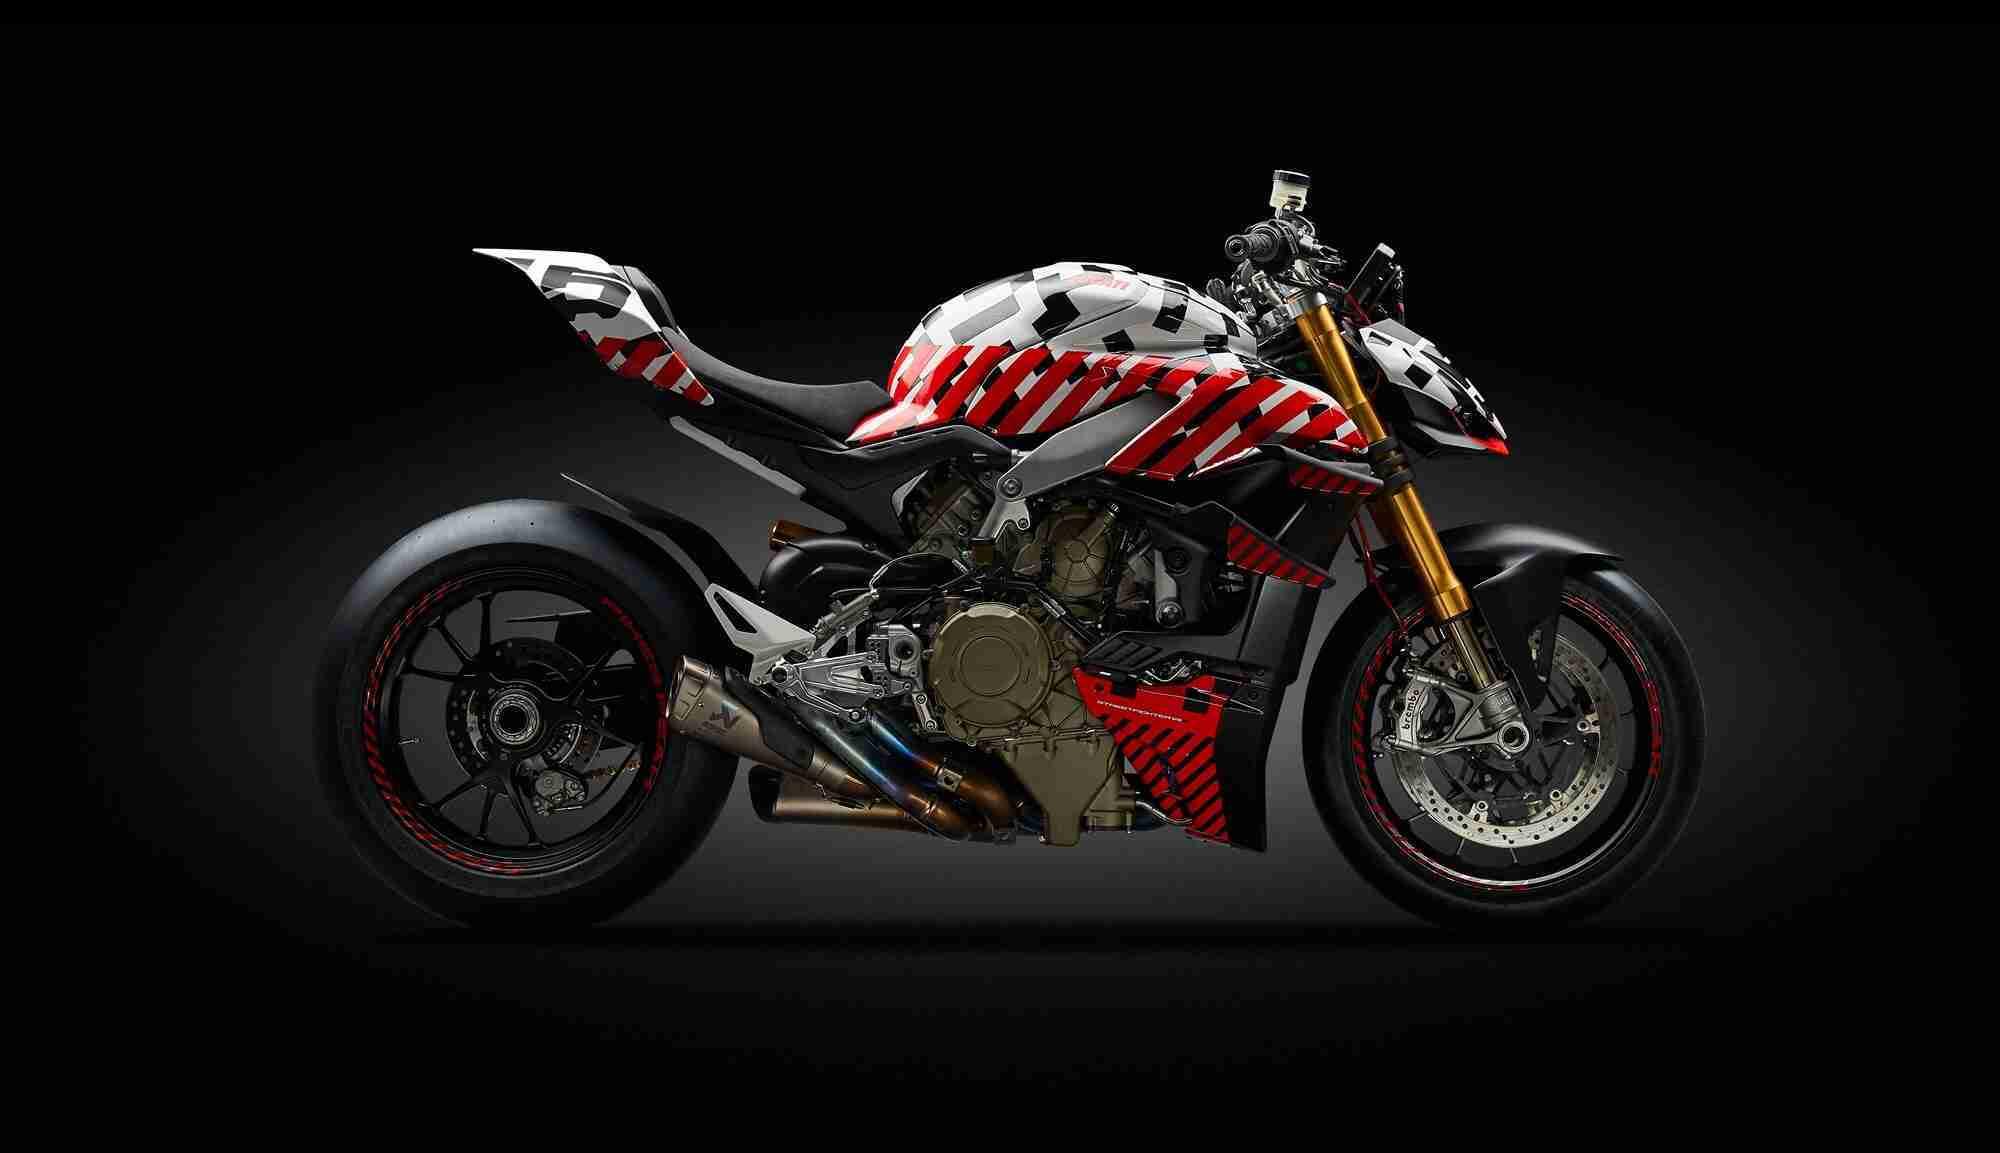 Ducati Streetfighter V4 prototype at Pikes Peak